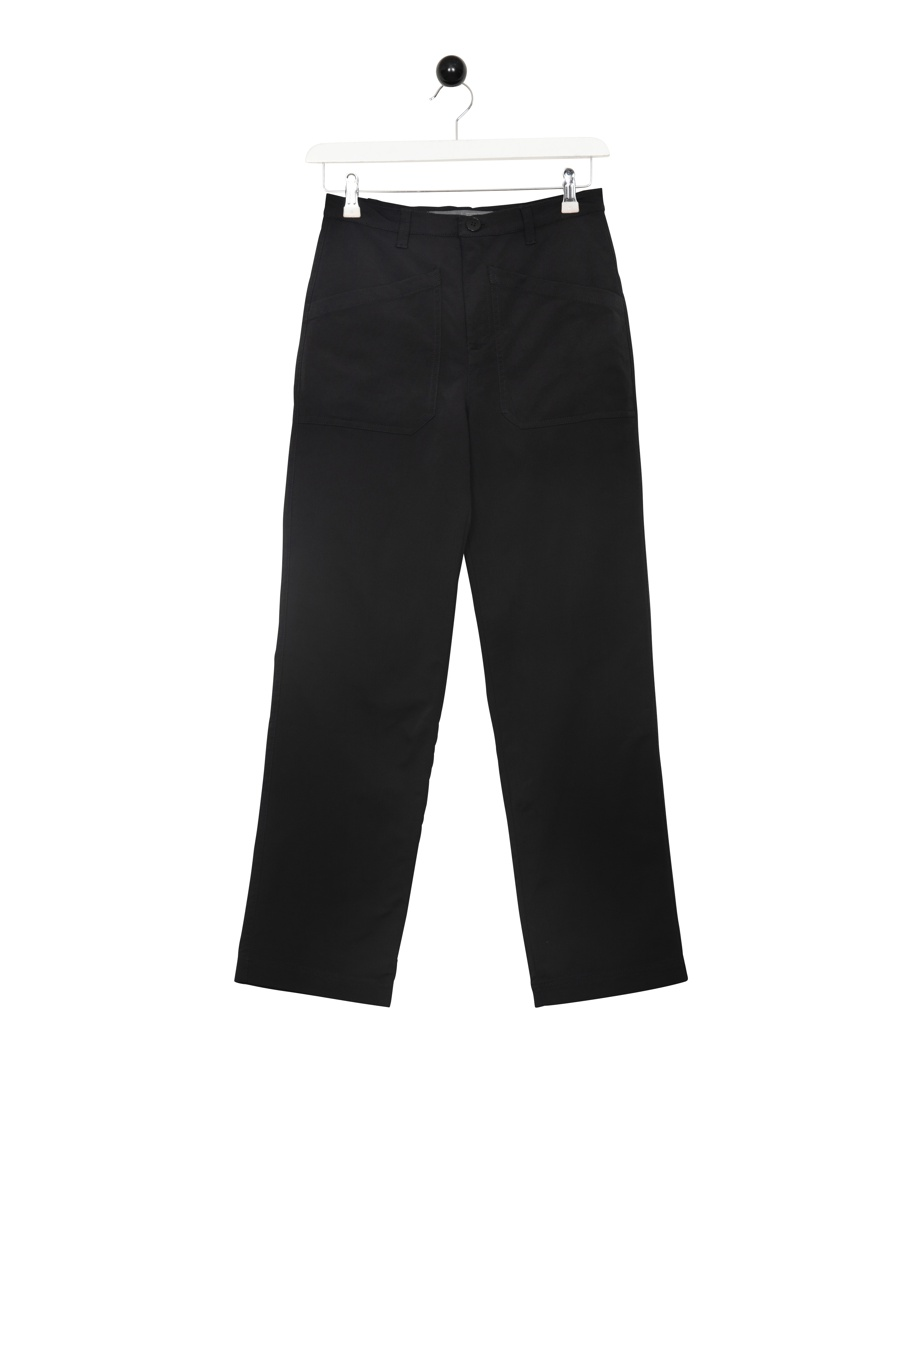 Return Obsidian Trousers